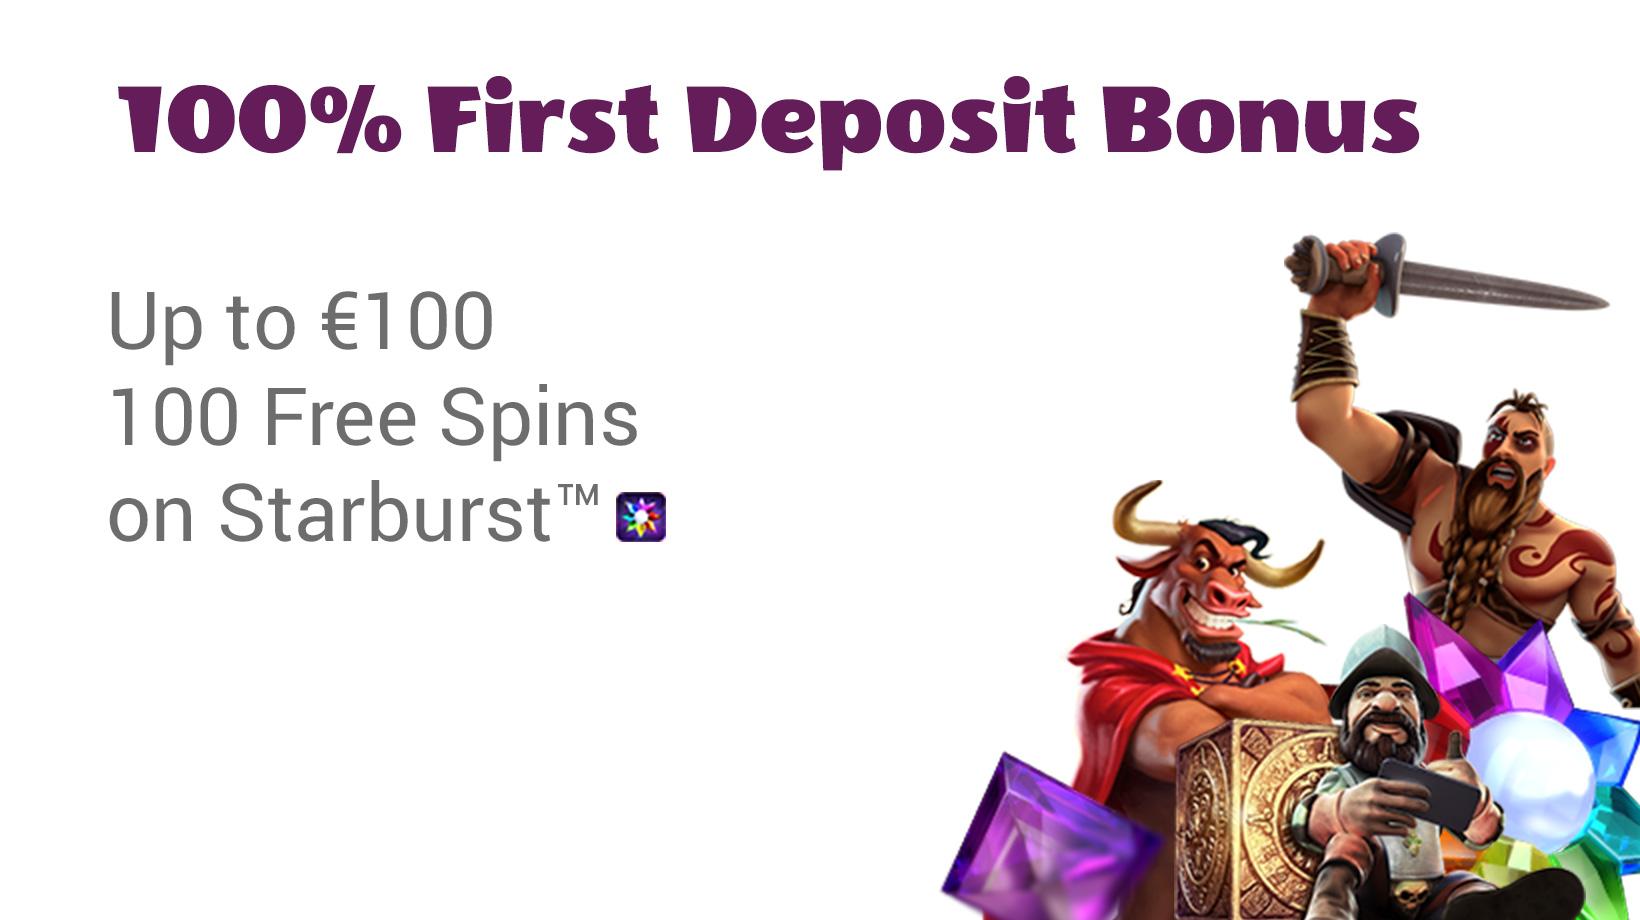 First Deposit Bonus up to €100 + 100 Free Spins on Starburst™